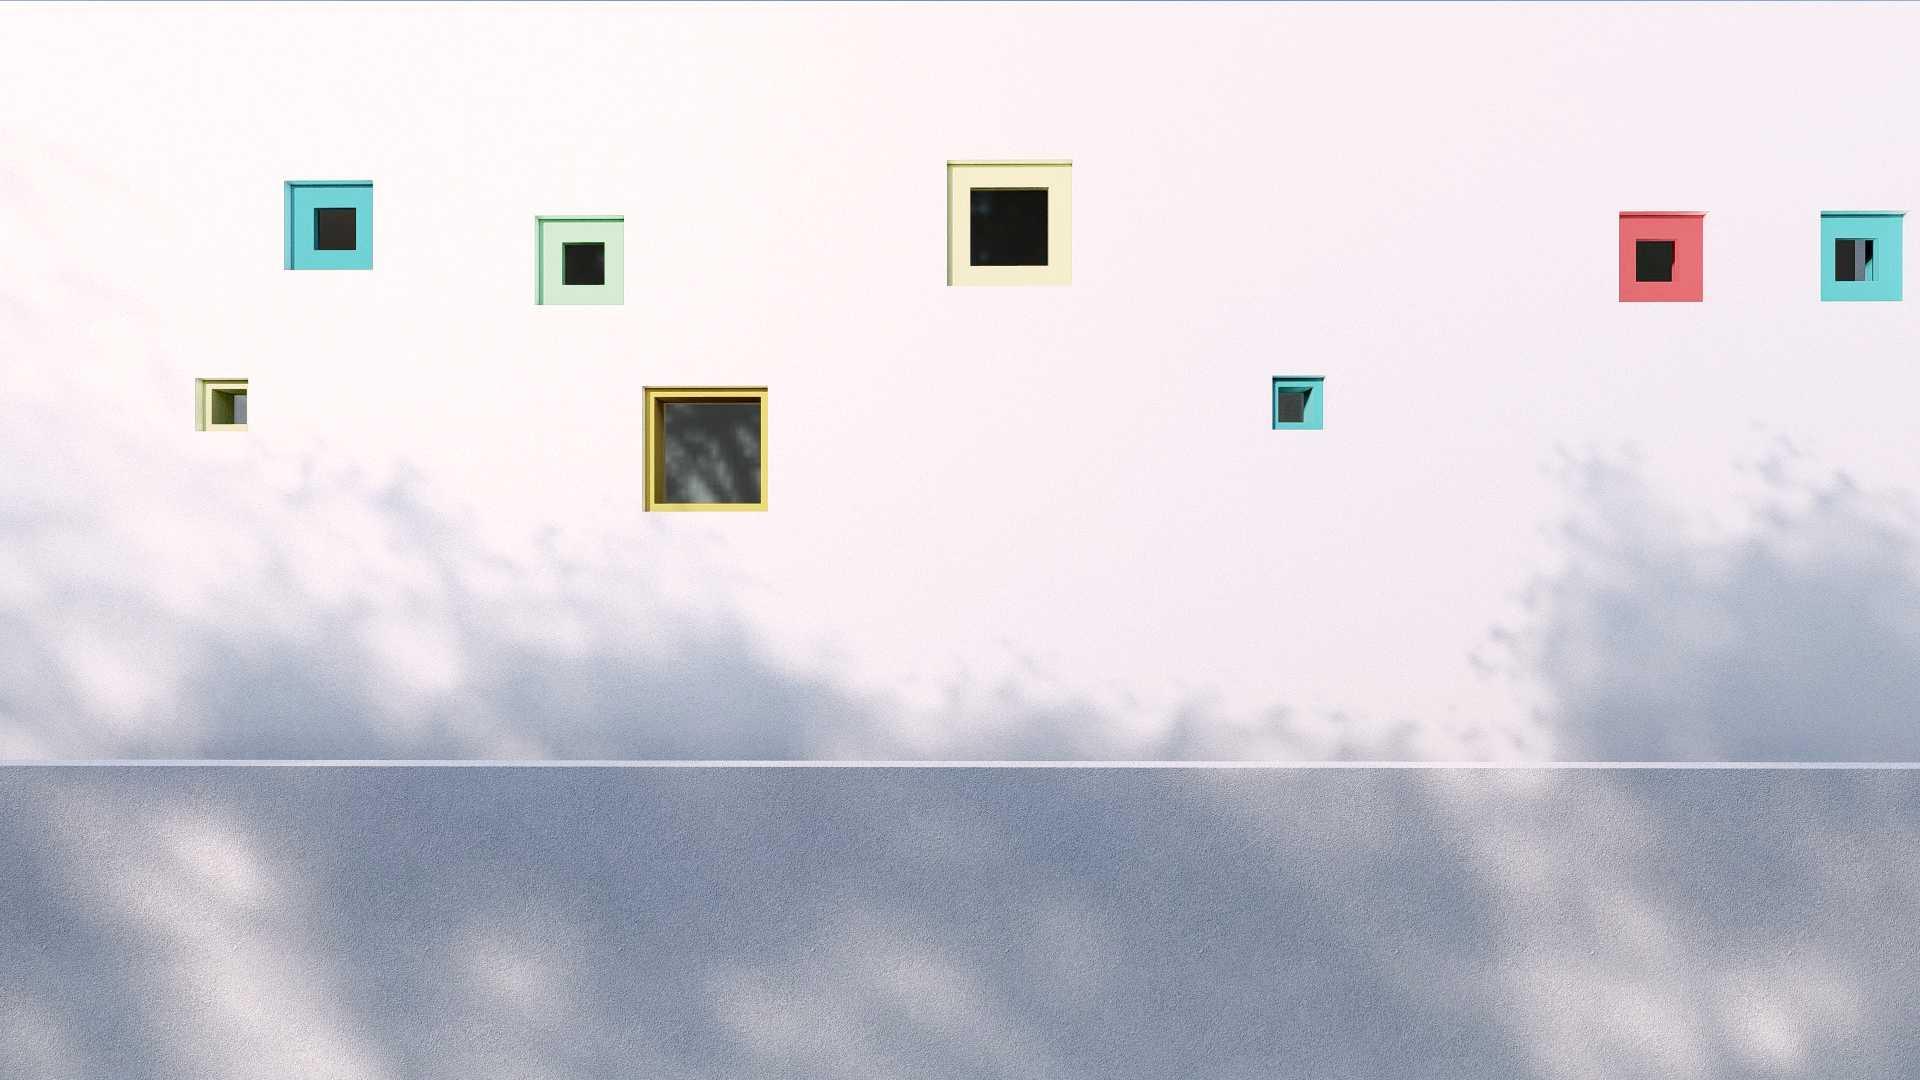 Guntur Haryadi Architecture Studio Pb Junior High School Jl. Alternatif Cibubur, Harjamukti, Cimanggis, Kota Depok, Jawa Barat 16454, Indonesia Jl. Alternatif Cibubur, Harjamukti, Cimanggis, Kota Depok, Jawa Barat 16454, Indonesia Guntur-Haryadi-Architecture-Studio-Pb-Junior-High-School   65554